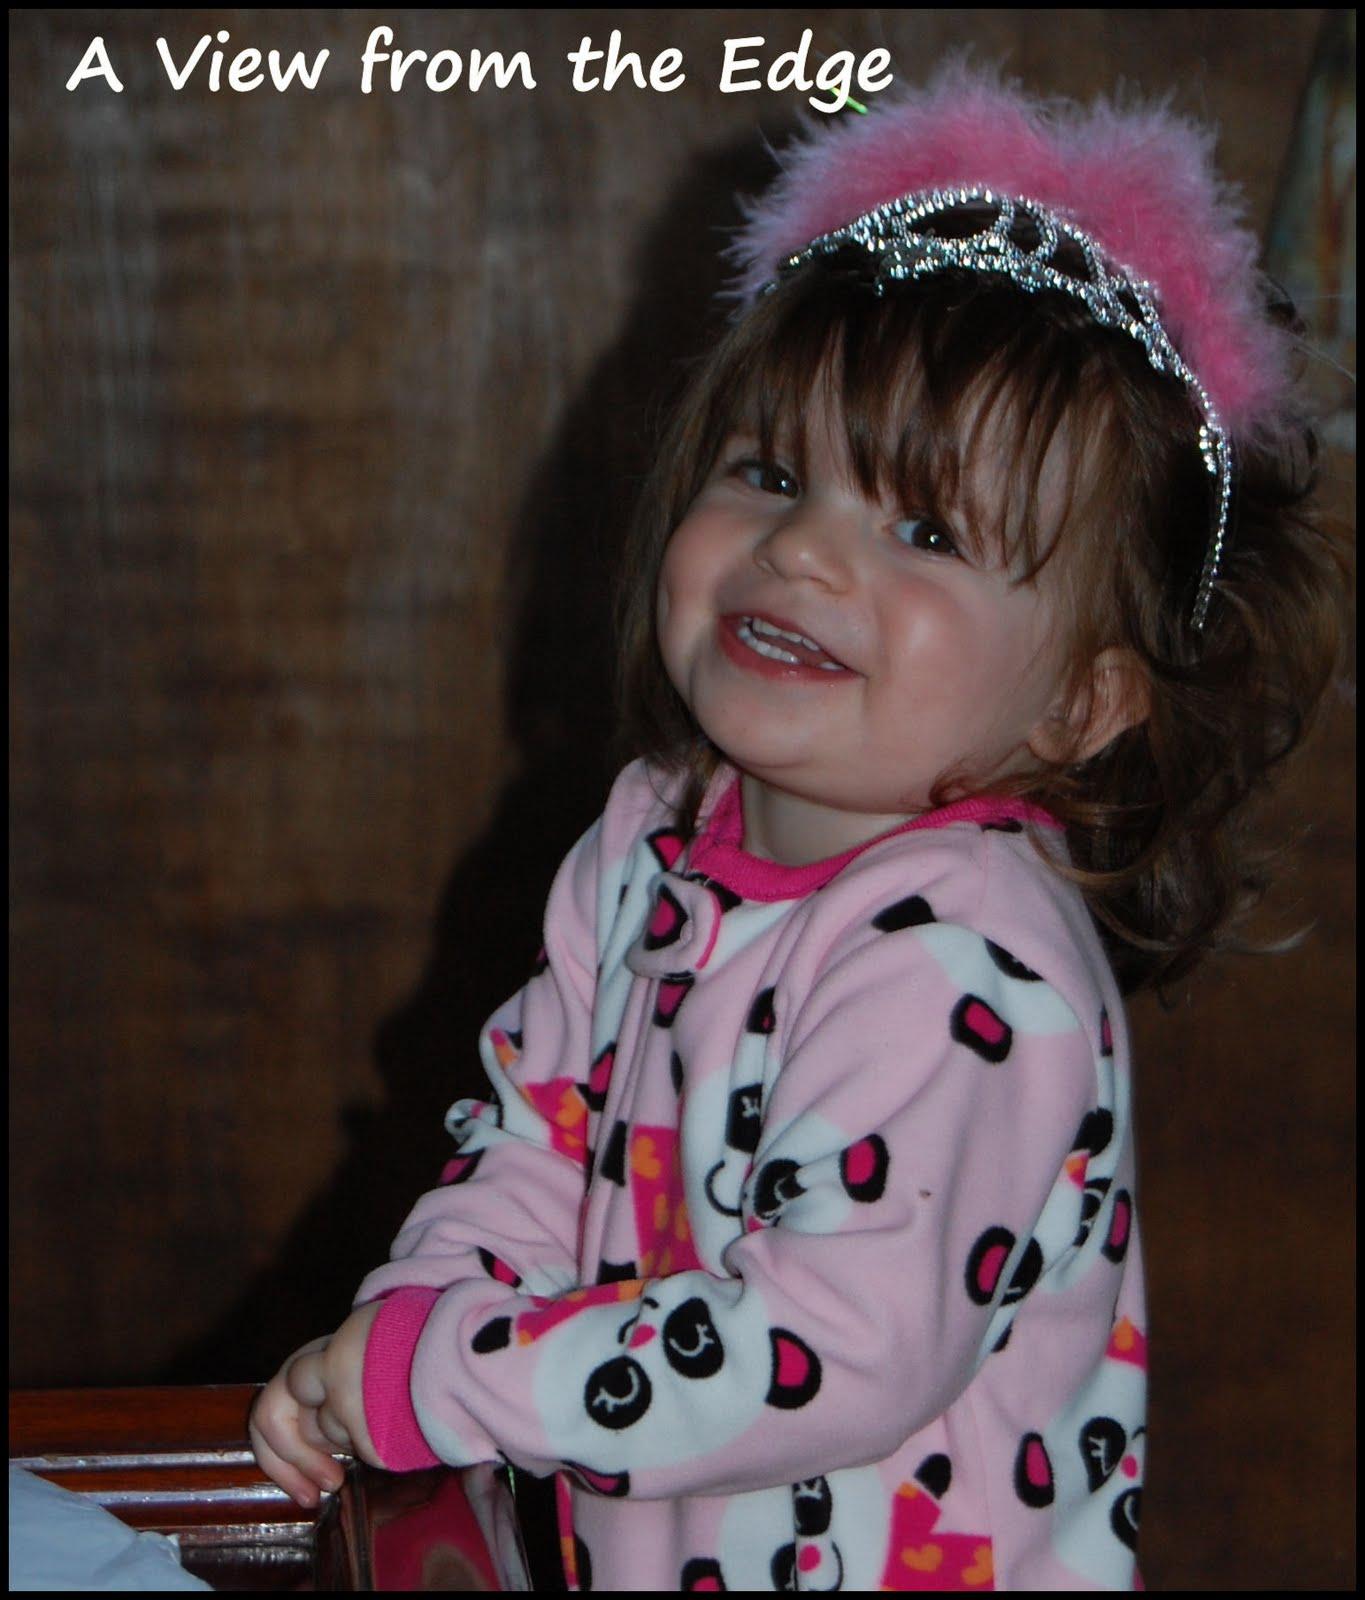 http://1.bp.blogspot.com/-aE8hC7udqbQ/Tfv-zFOrKpI/AAAAAAAAIek/d97sovyXLTo/s1600/a+true+princess.jpg